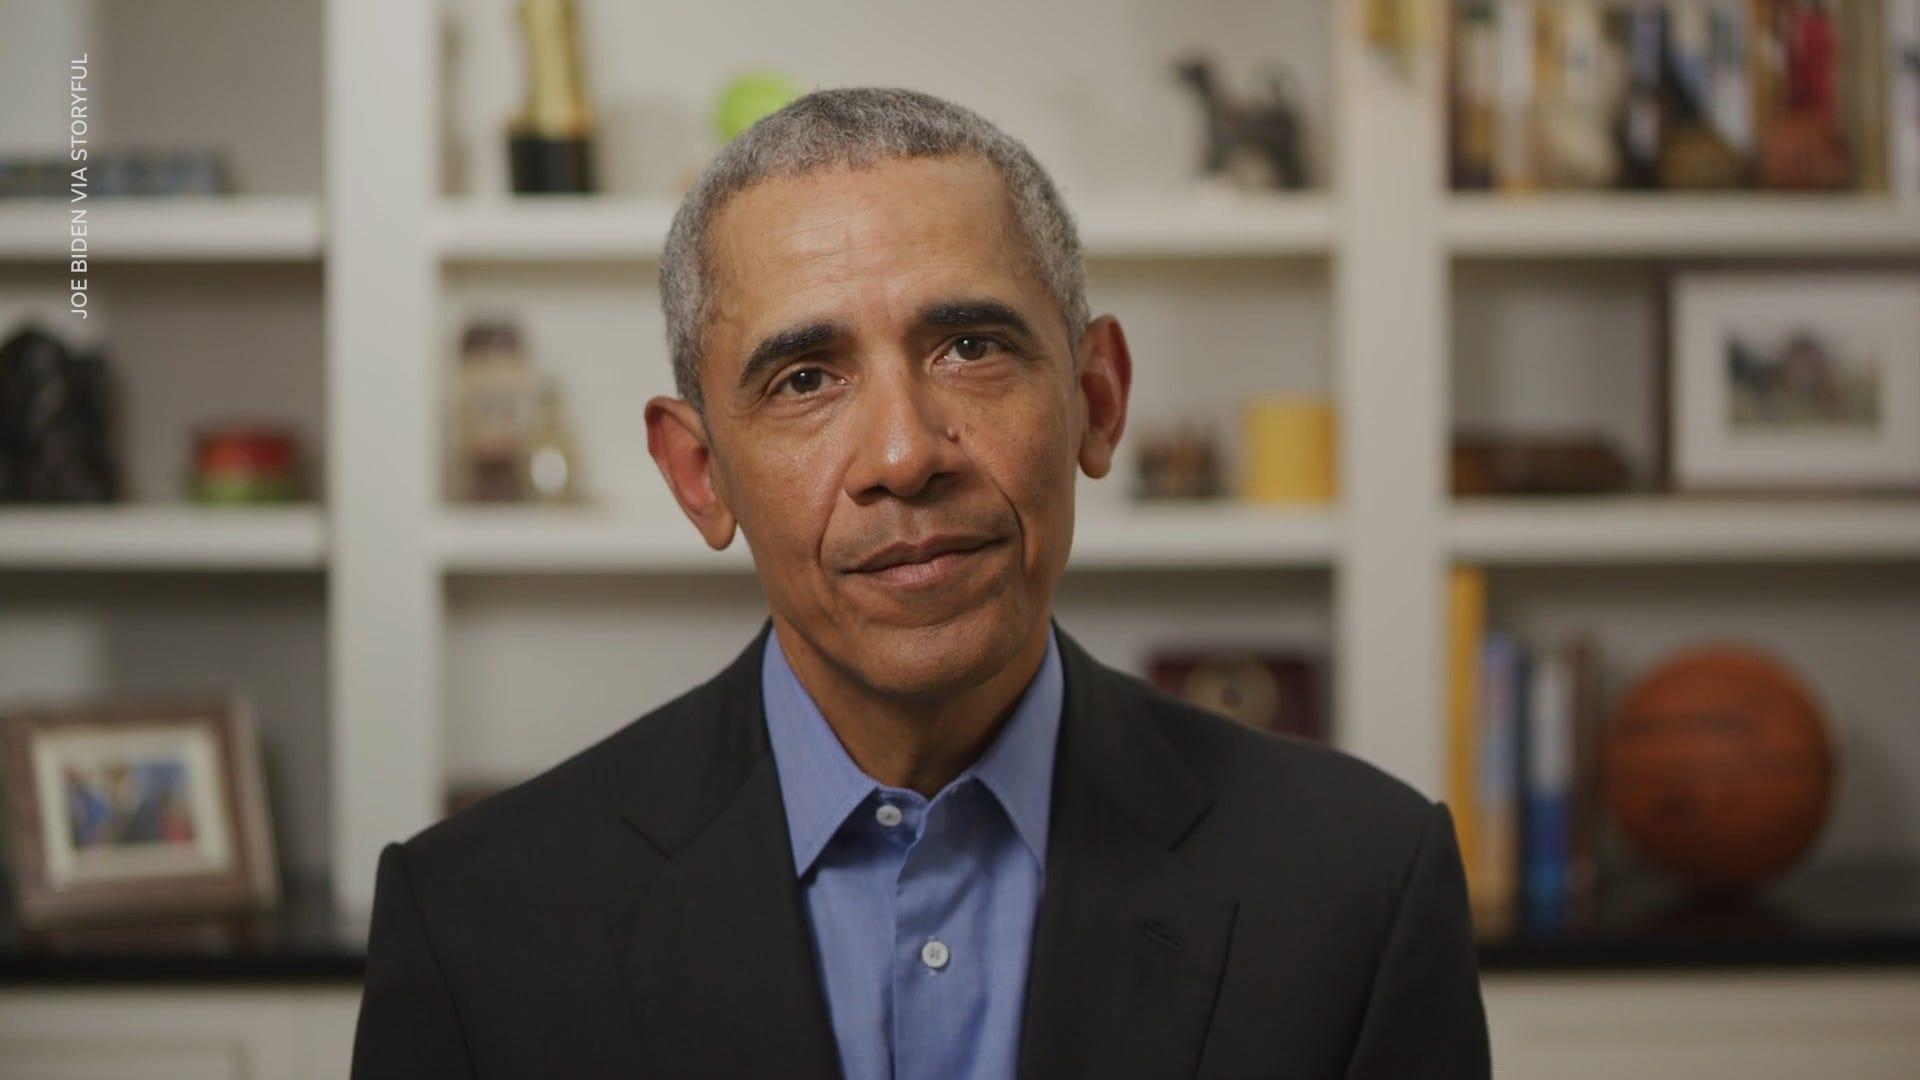 Coronavirus updates: Obama criticizes US response again; tourist arrested in Hawaii; North Carolina churches ruling